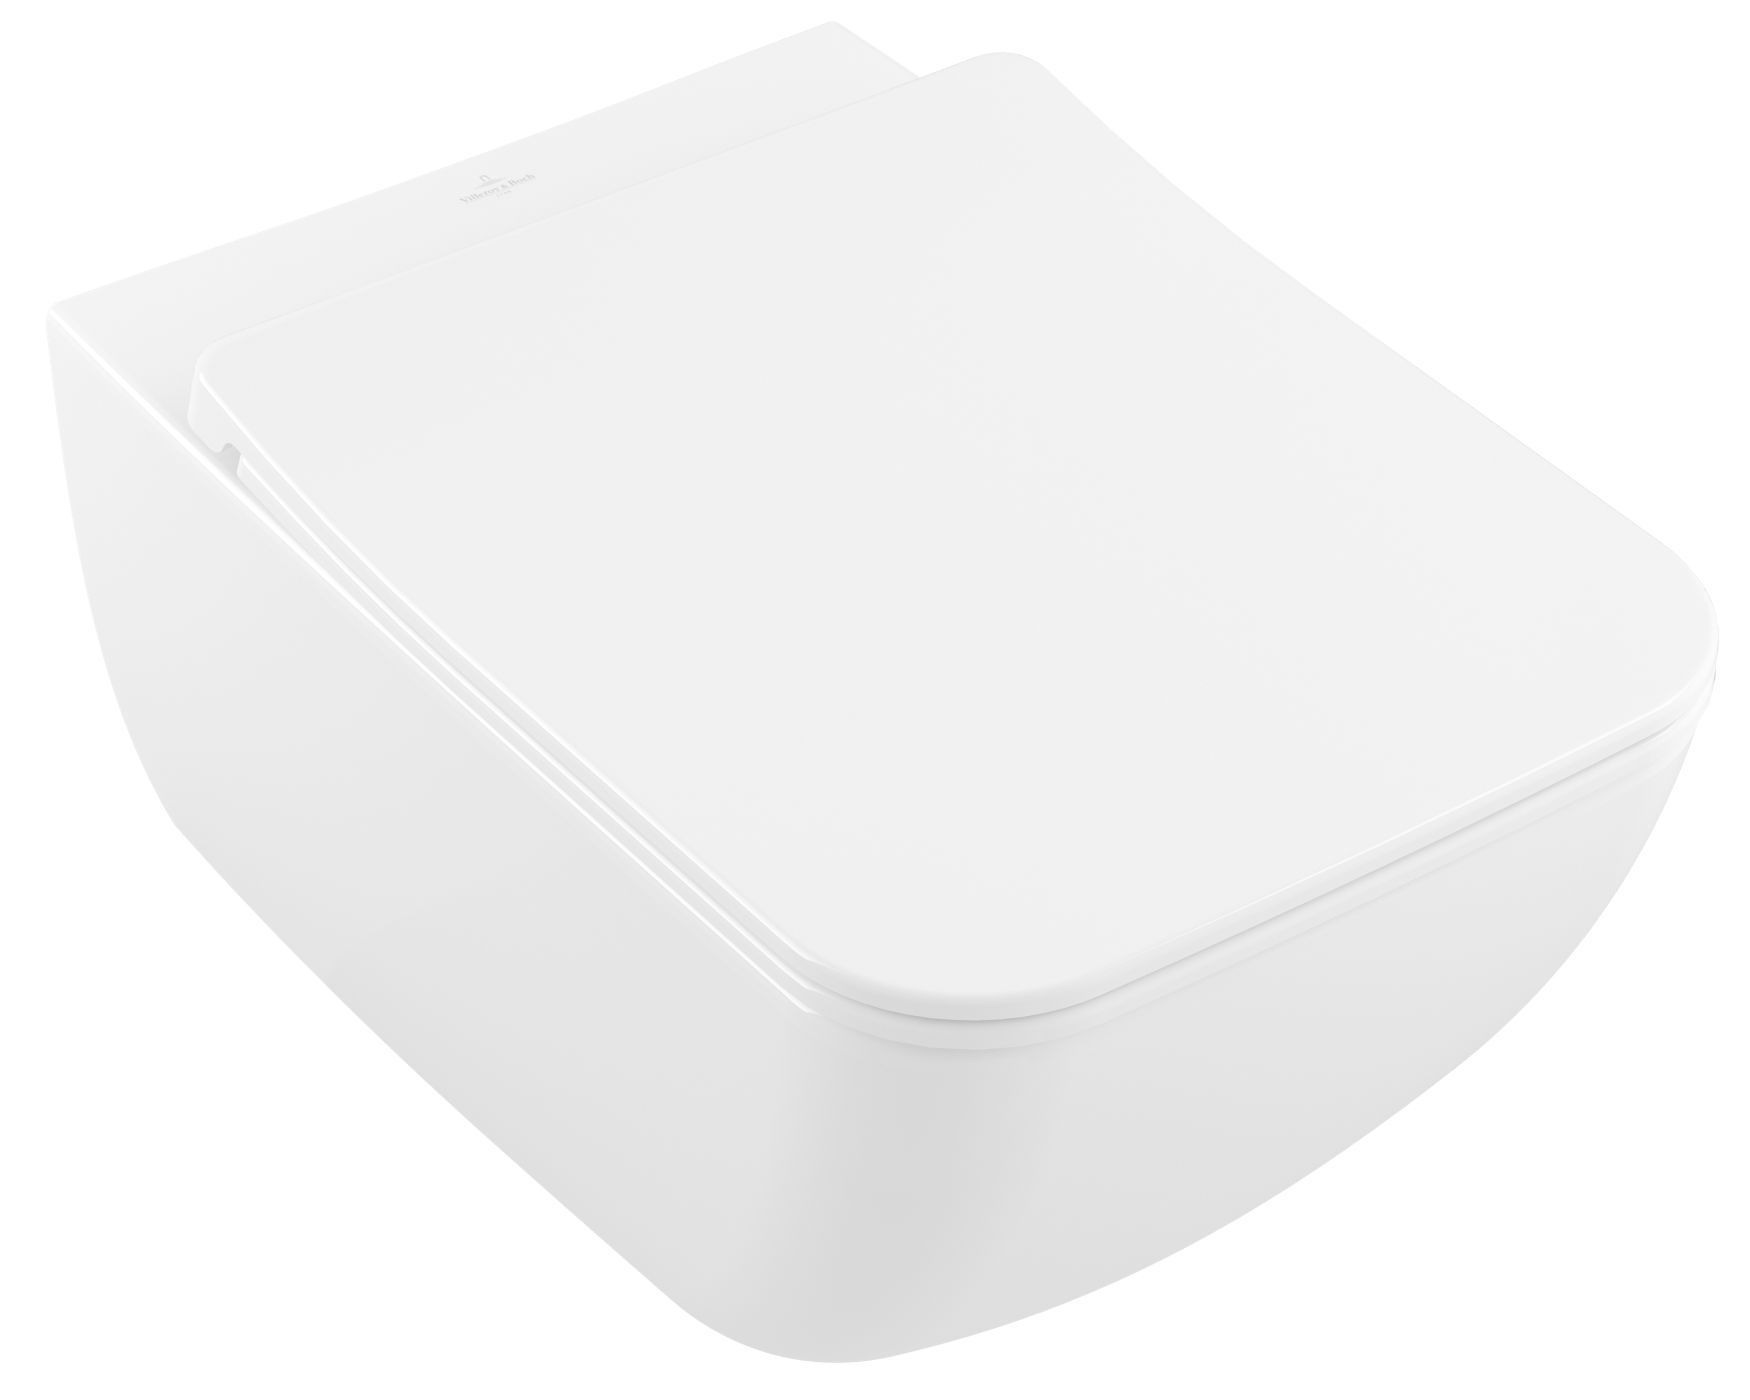 Villeroy & Boch Venticello Wand-Tiefspül-WC Combi-Pack DirectFlush L:56 B:37,5cm weiß 4611RL01